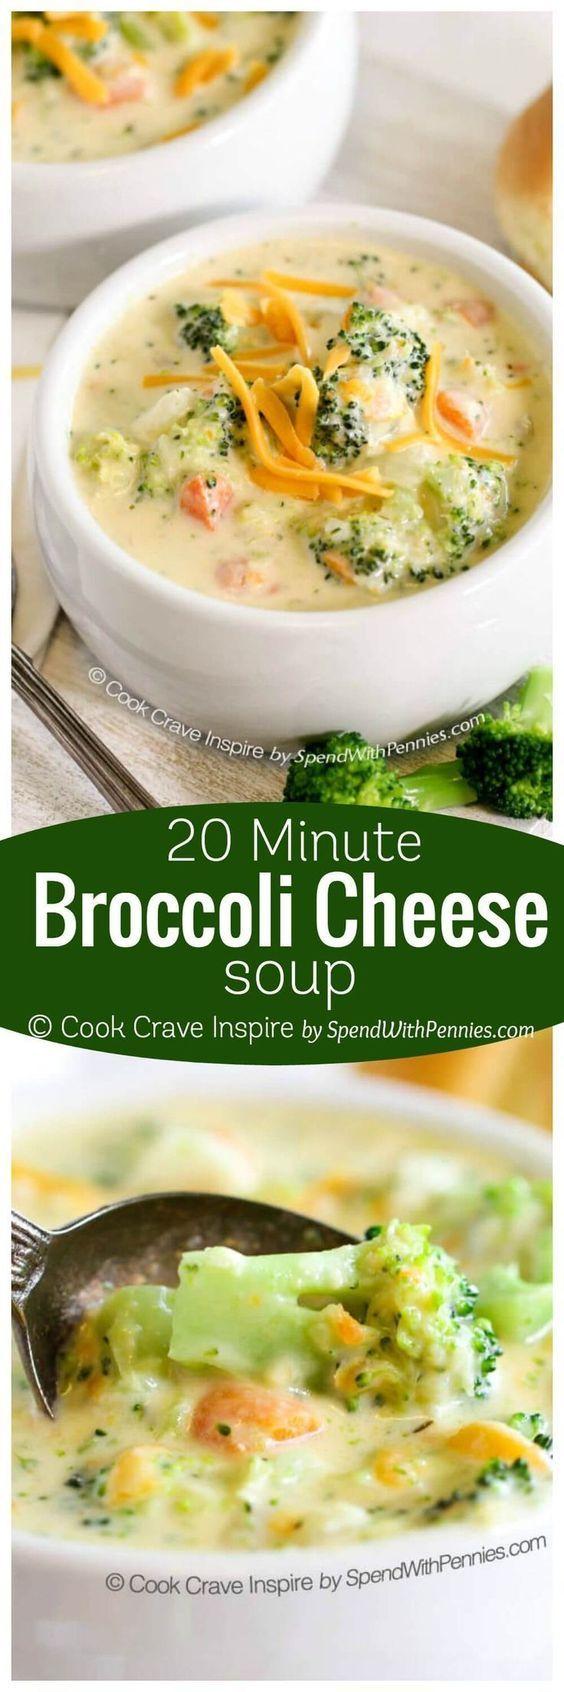 100+ Broccoli Soup Recipes on Pinterest | Cream Of Broccoli Soup, Soup ...